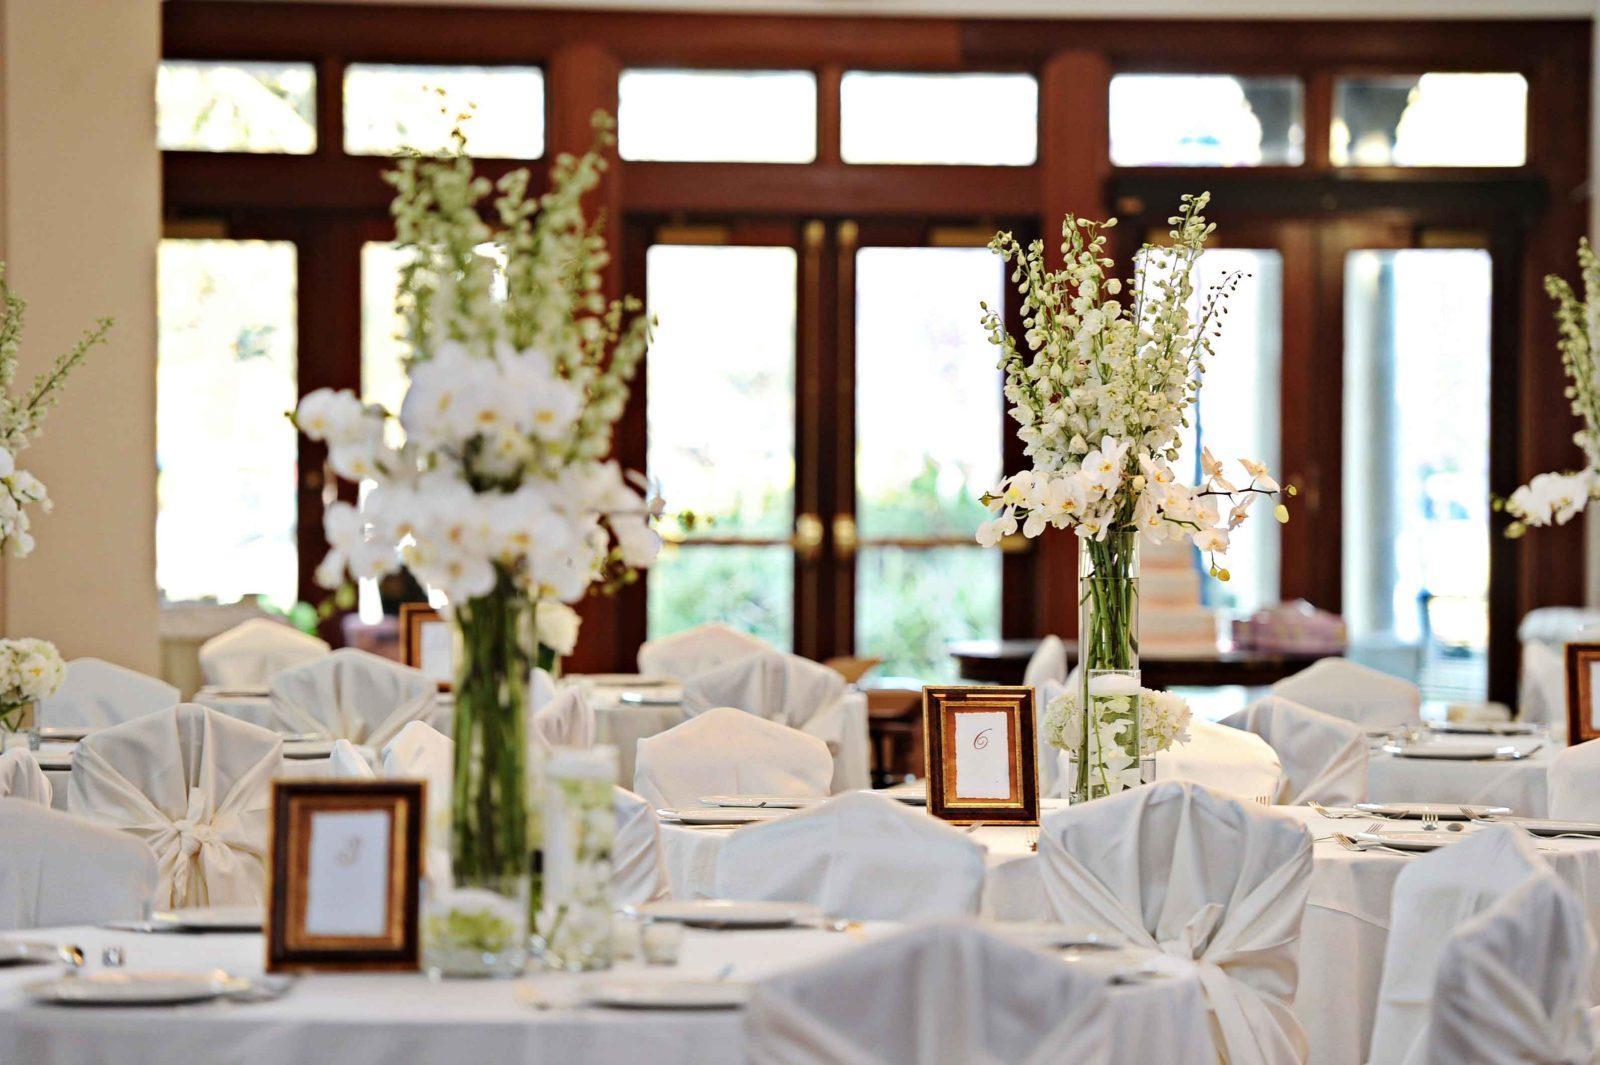 Beautiful flowers decorate tables at an Audubon Tea Room wedding reception. Photo: Studio Tran